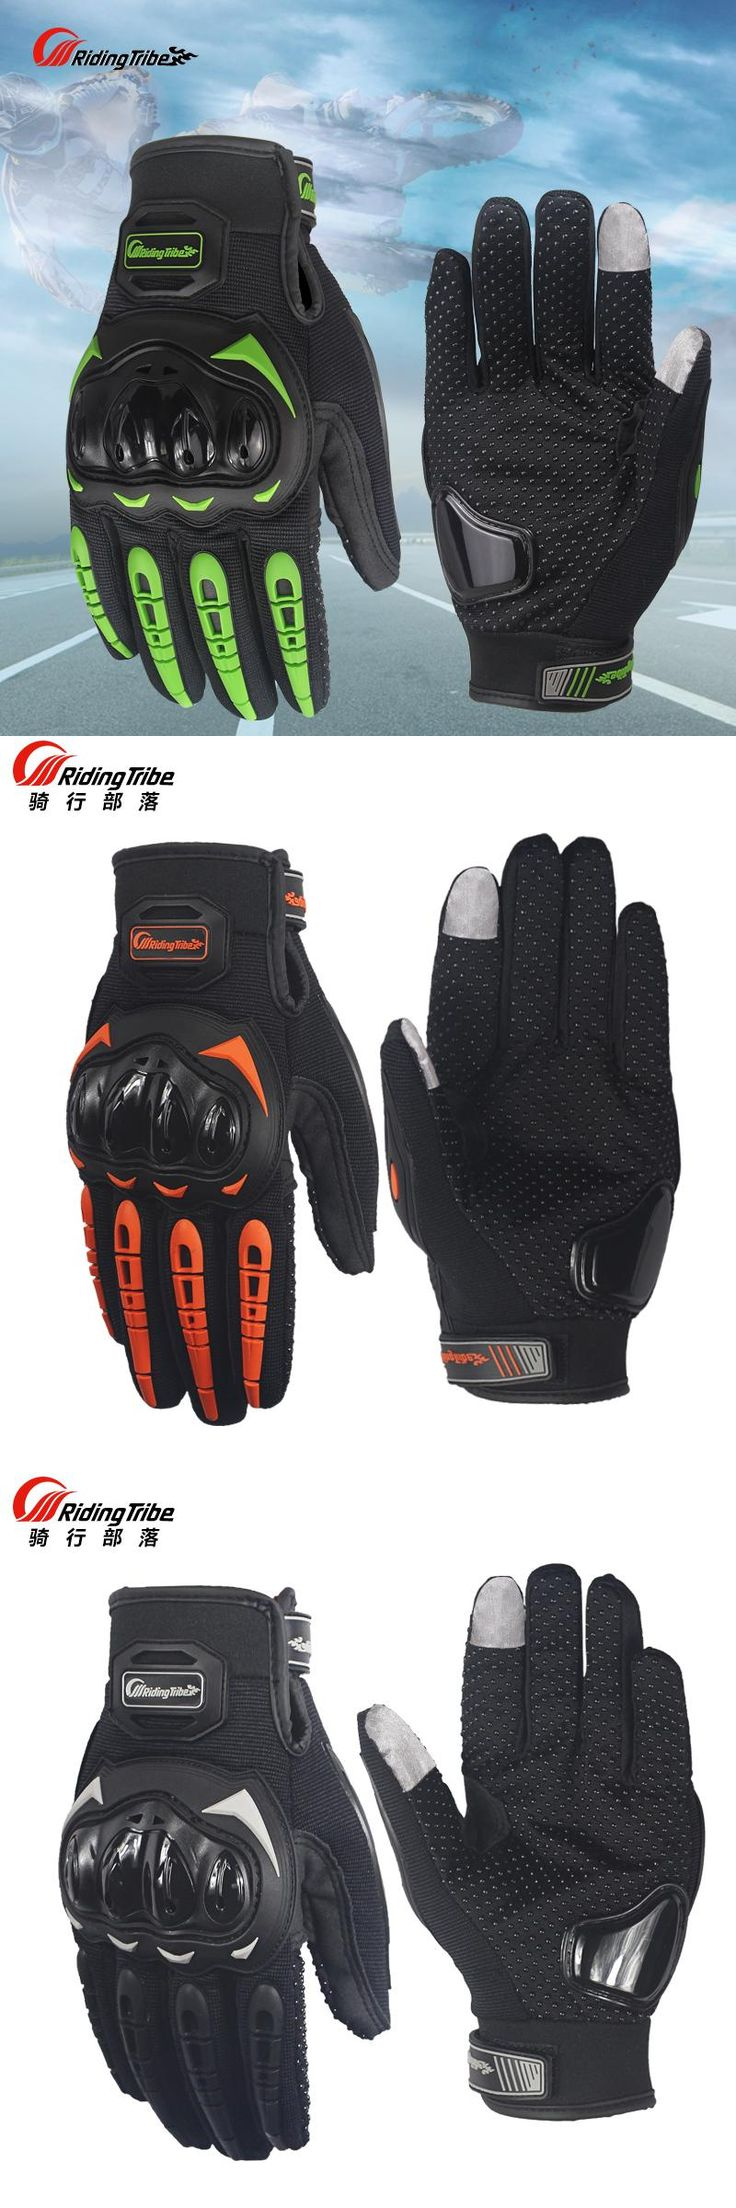 [Visit to Buy] New Arrival Motorcycle gloves Racing Luva Motoqueiro Guantes Moto Motocicleta Luvas de moto Cycling Motocross gloves Gants Moto #Advertisement